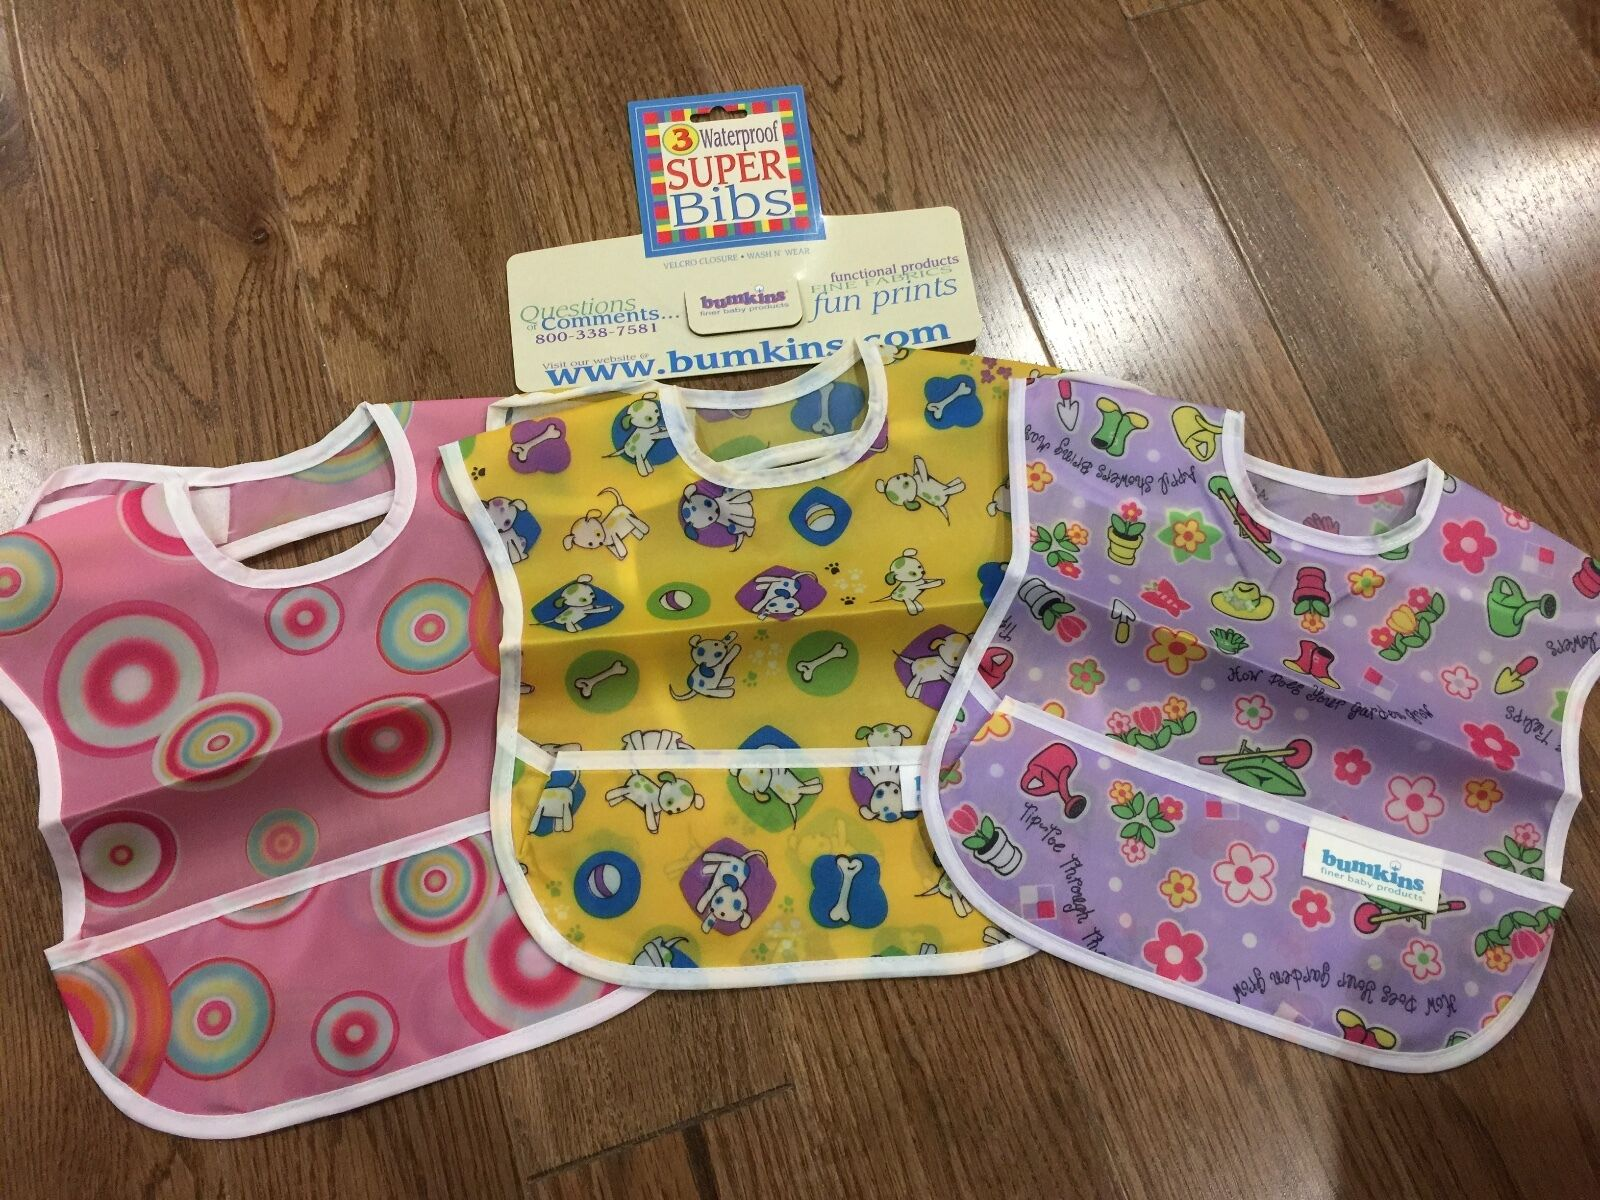 NEW Bumkins 3 Pack Waterproof SuperBibs Girl Boy Pink Puppy